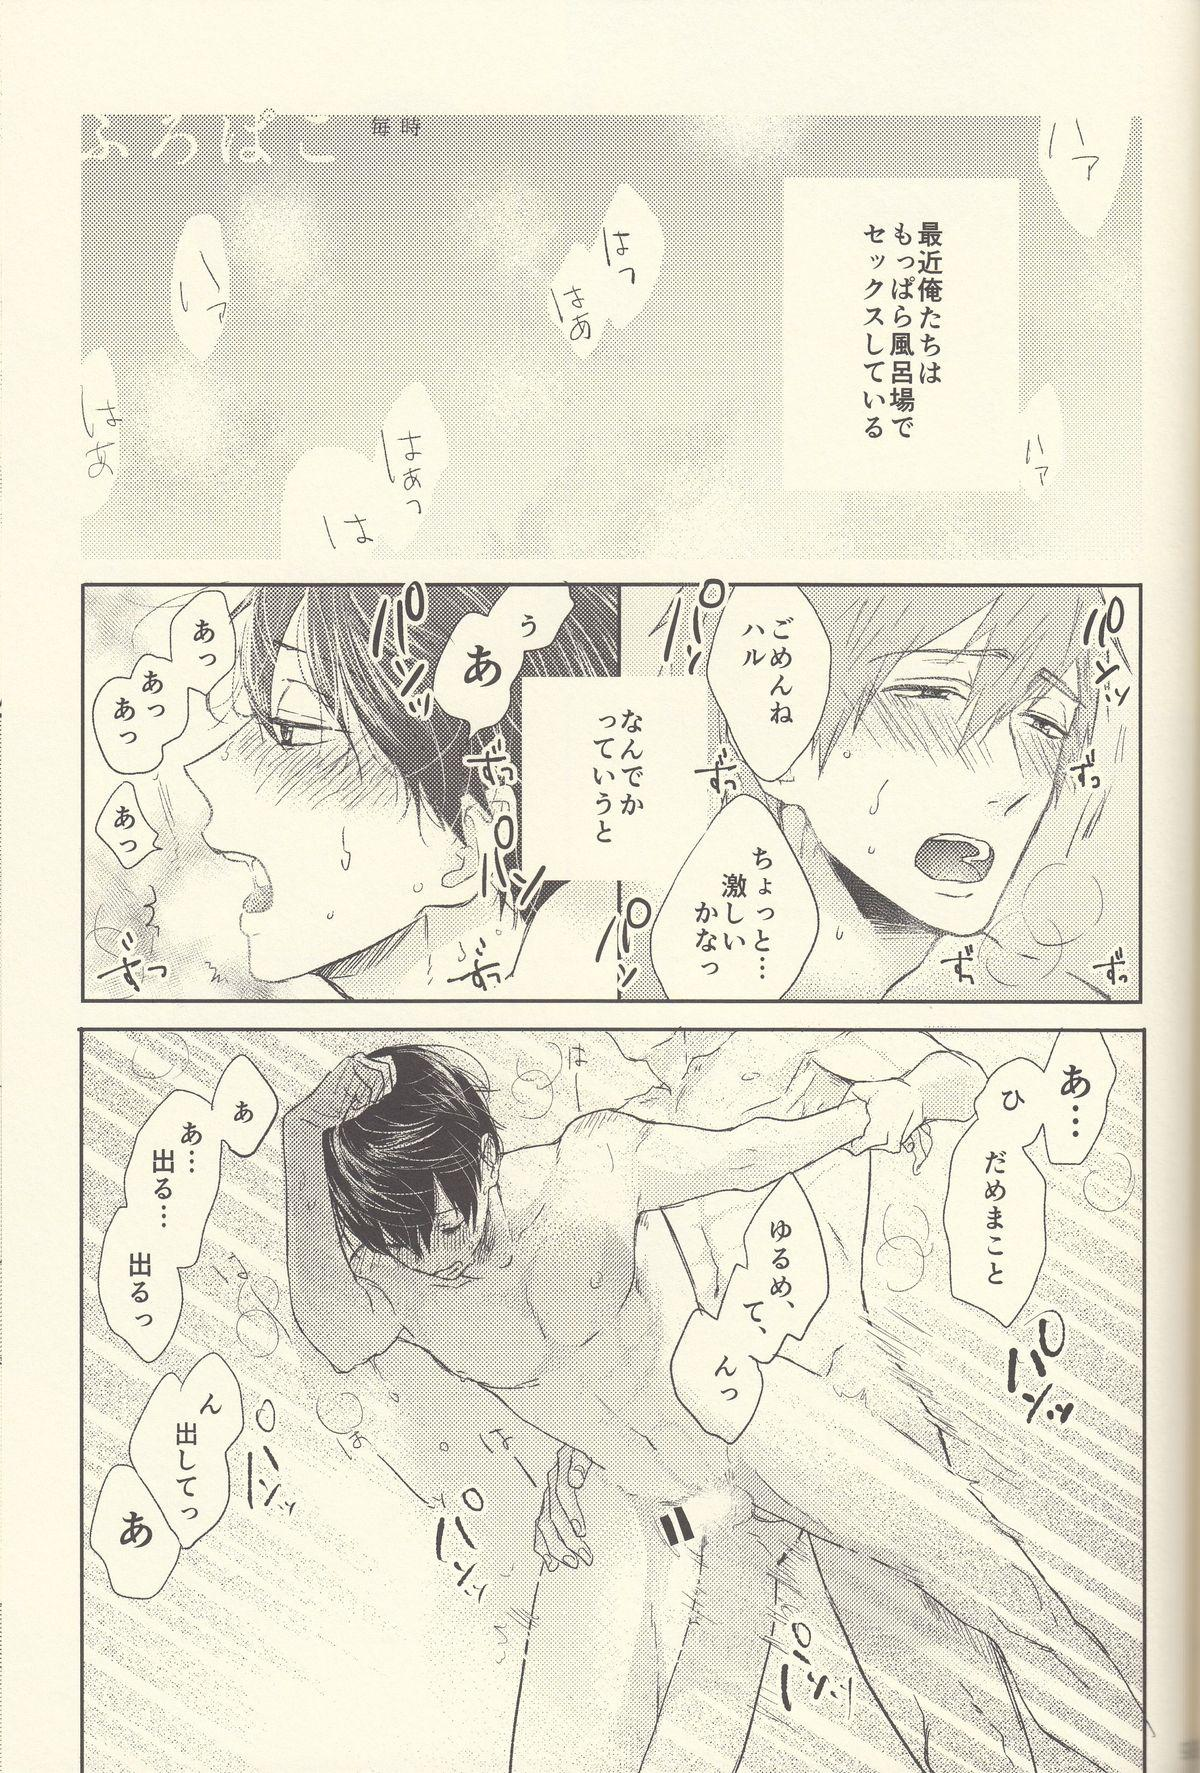 Shiofuki no Friendship - Makoto ♥ Haruka Squirting Anthology 59